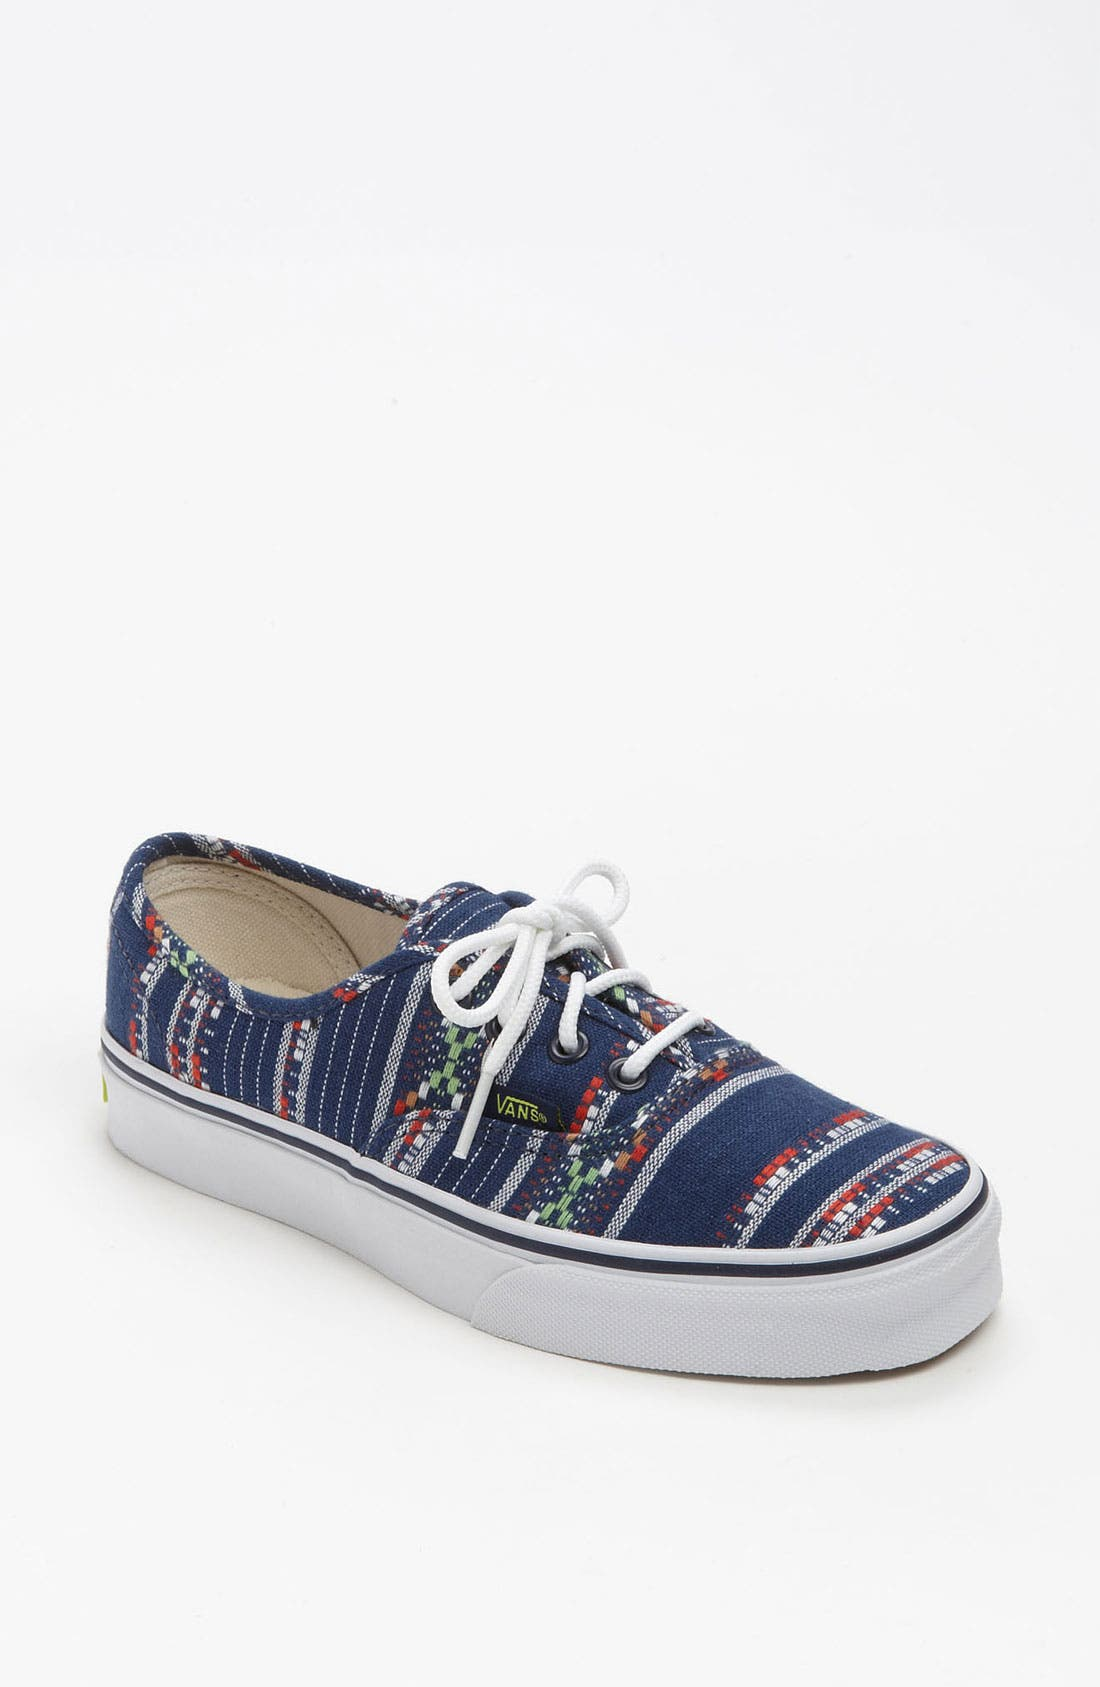 Main Image - Vans 'Authentic - Guate Stripe' Sneaker